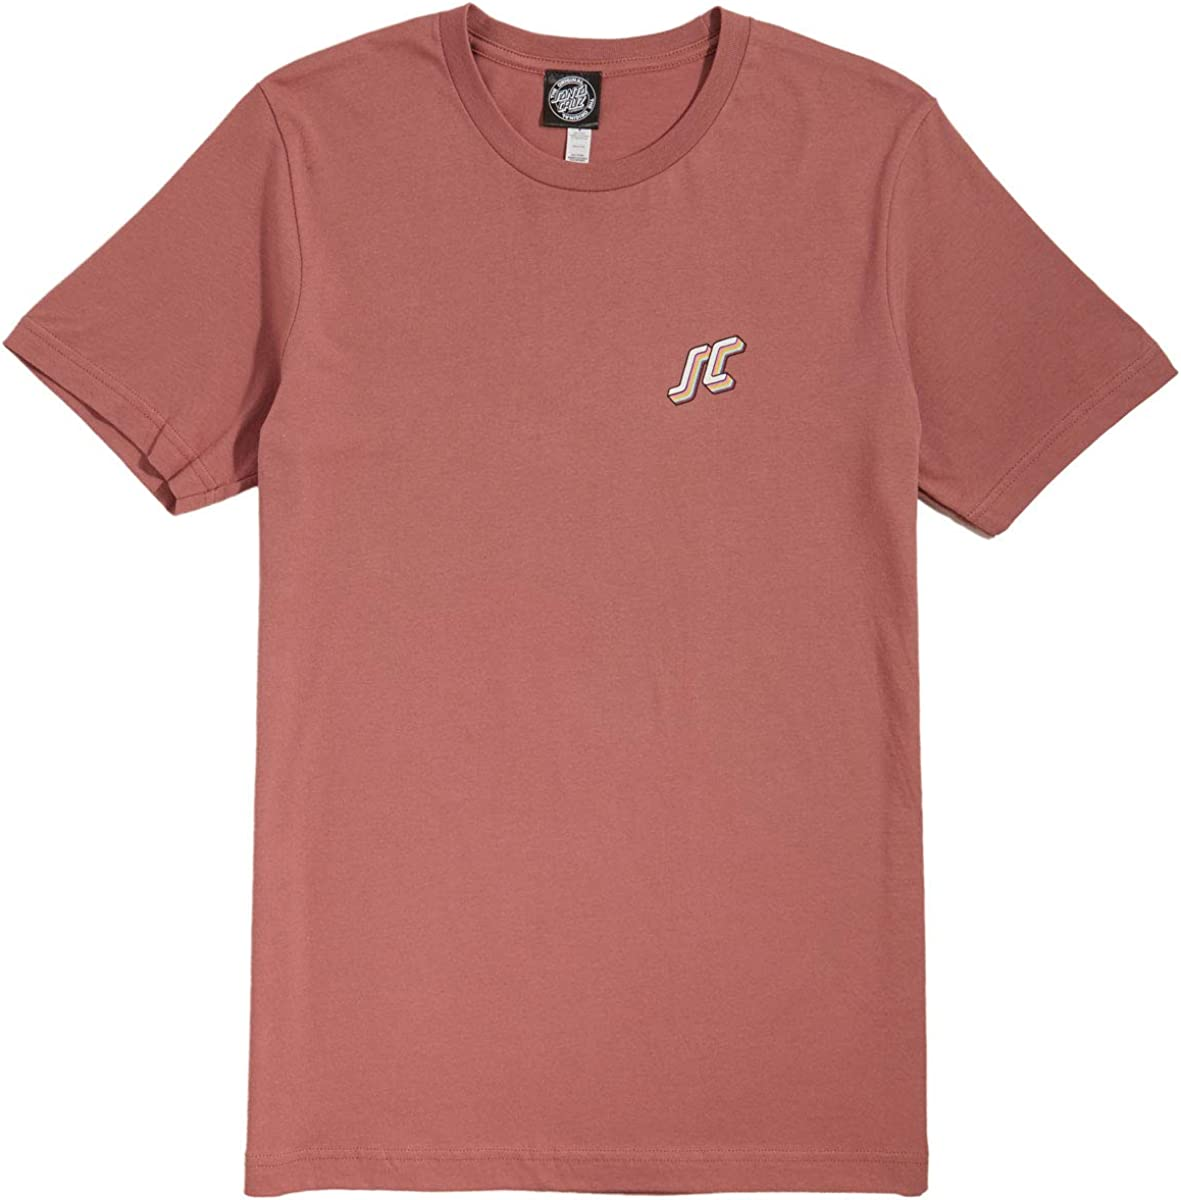 Santa Cruz Women's Roll Boyfriend Shirts